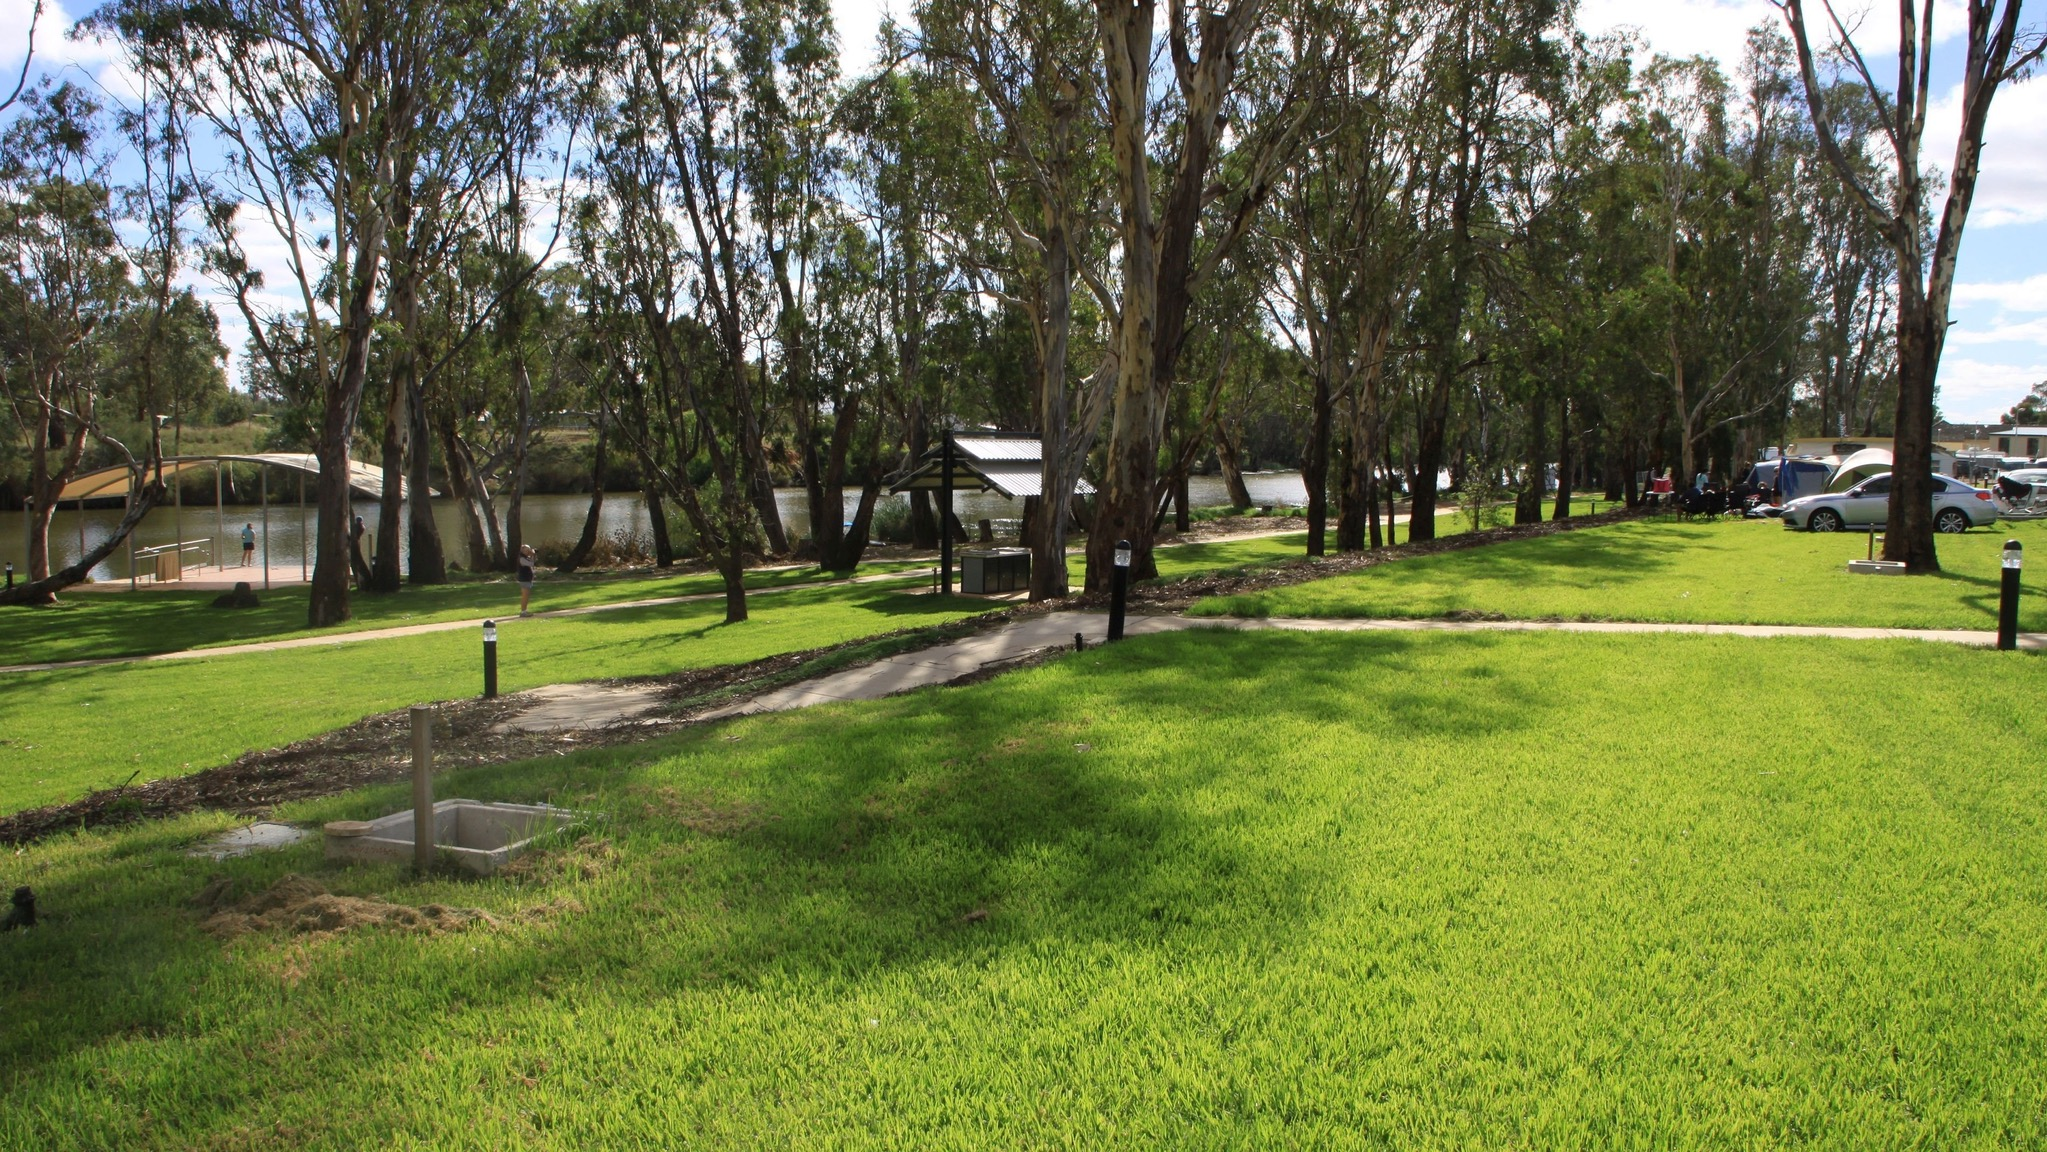 Sites at the Bridgewater Public Caravan Park